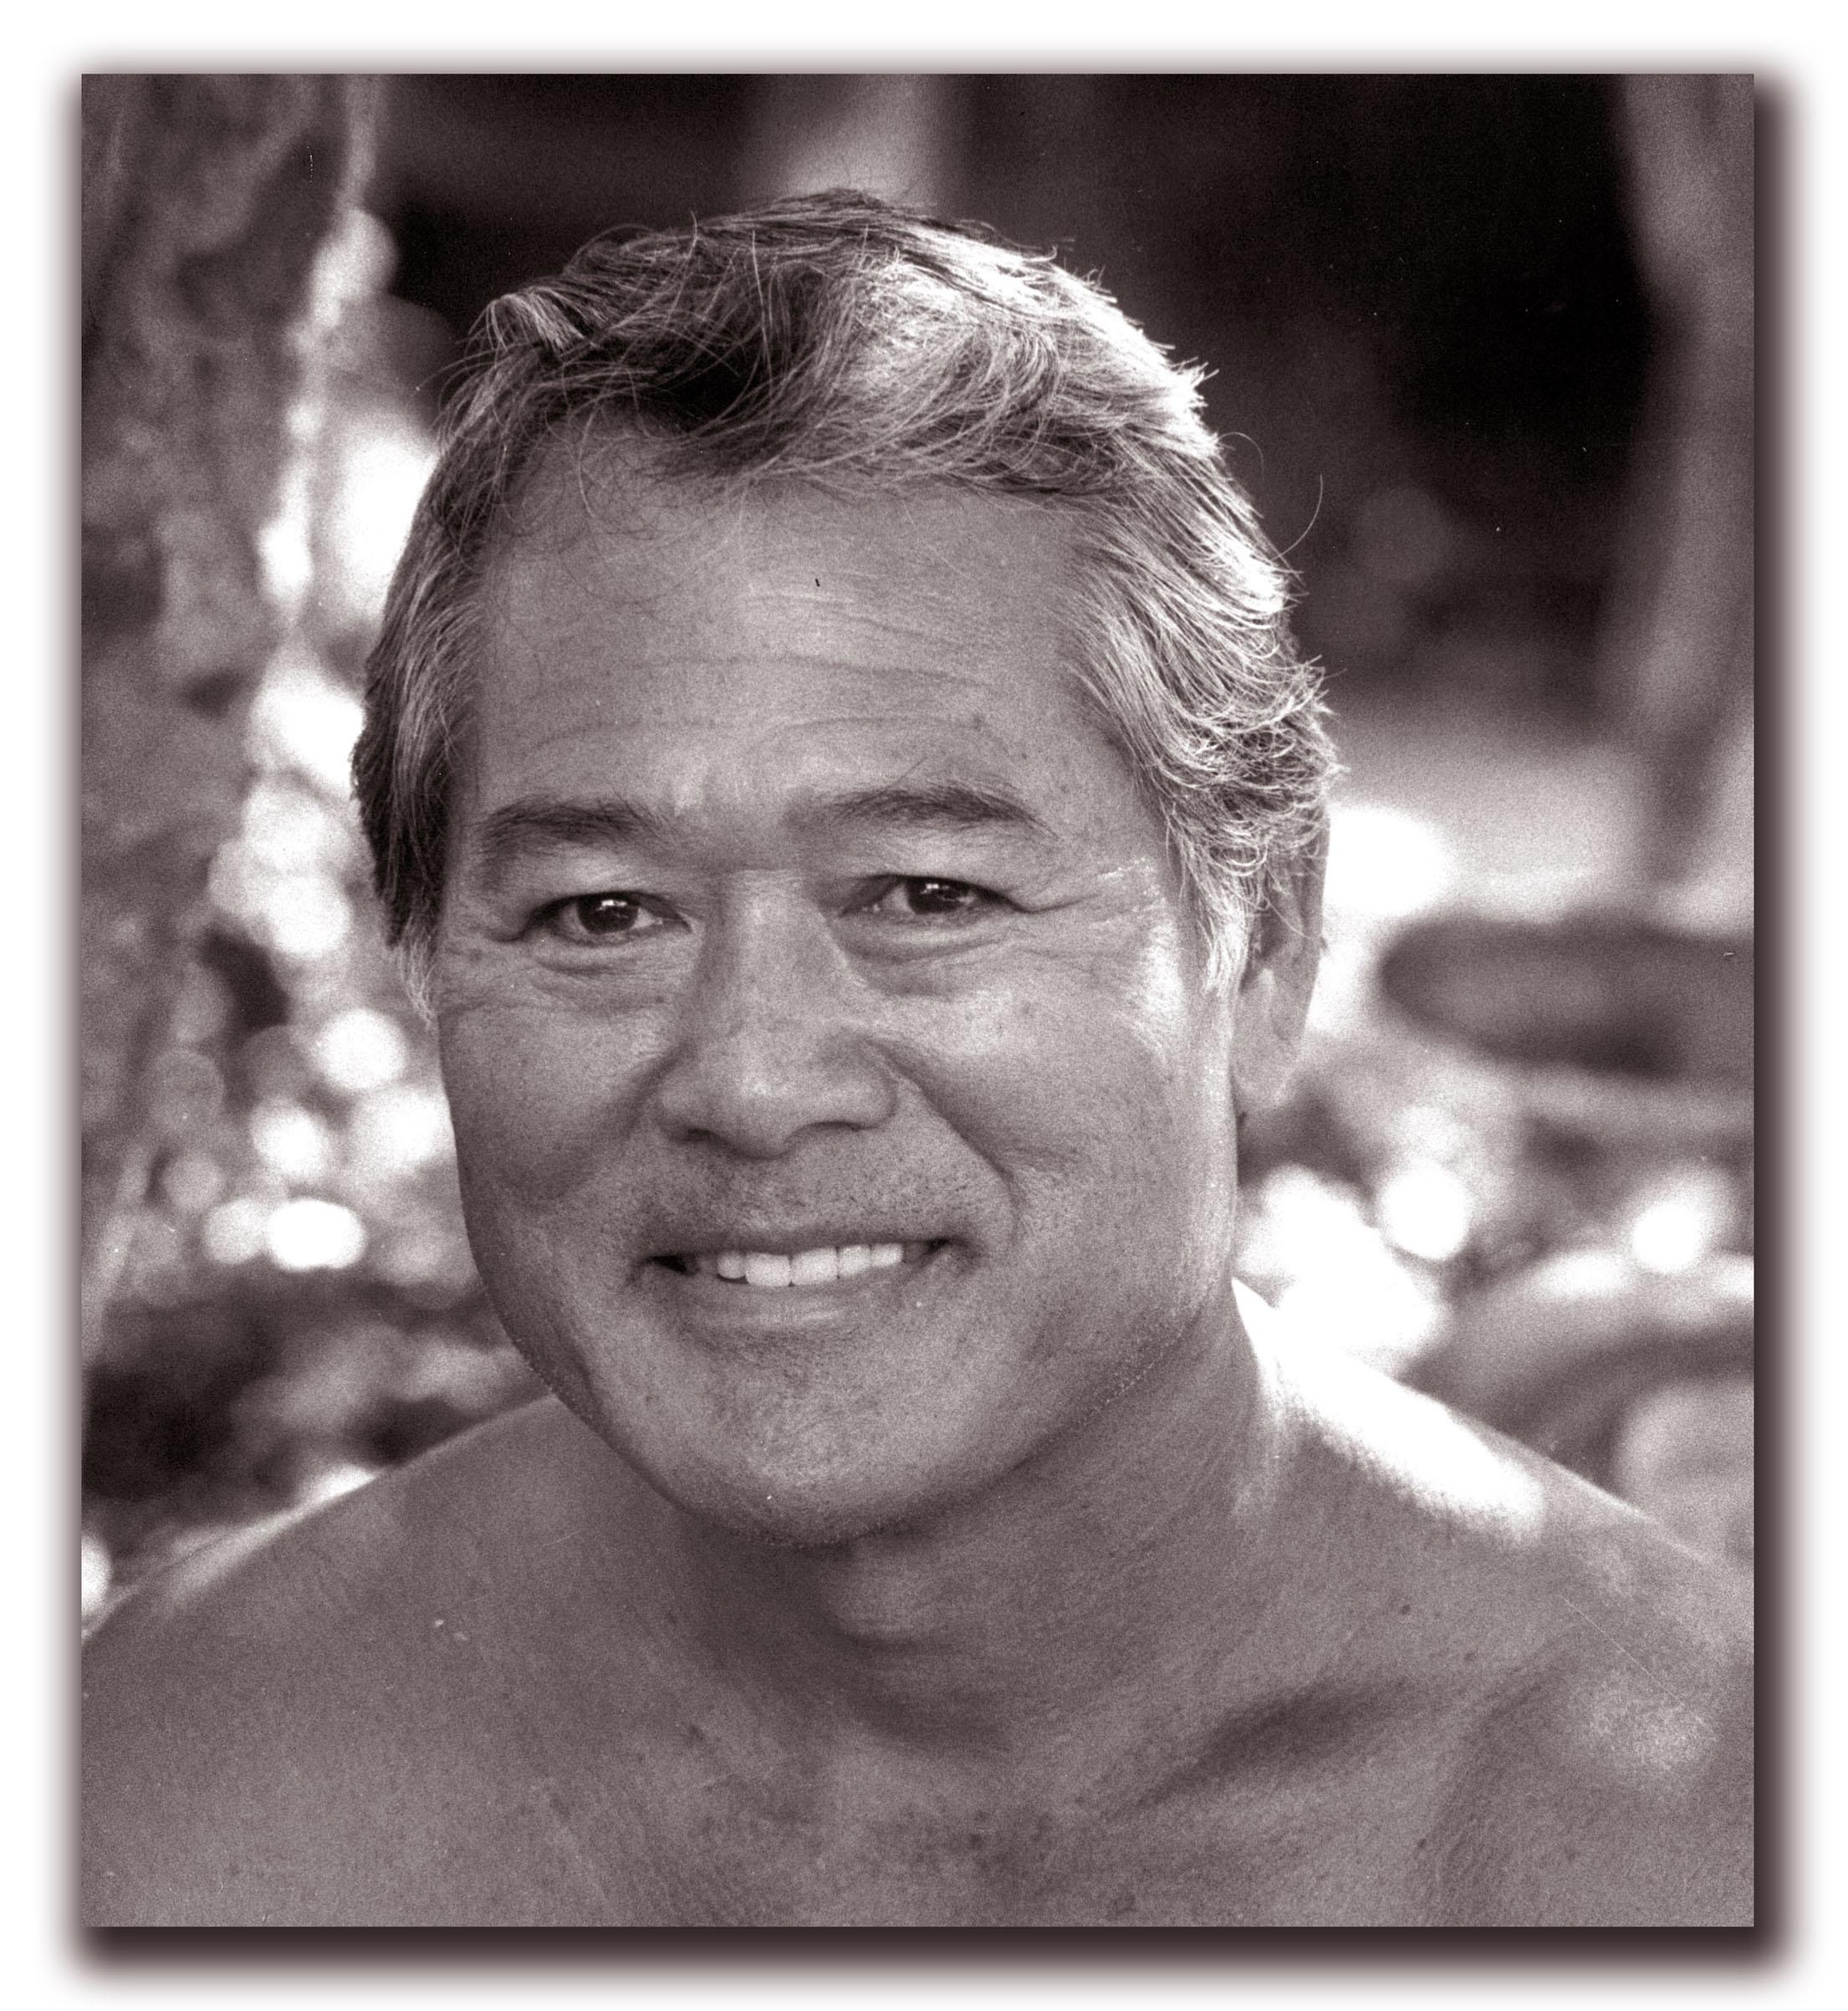 Hiroshi Tagami